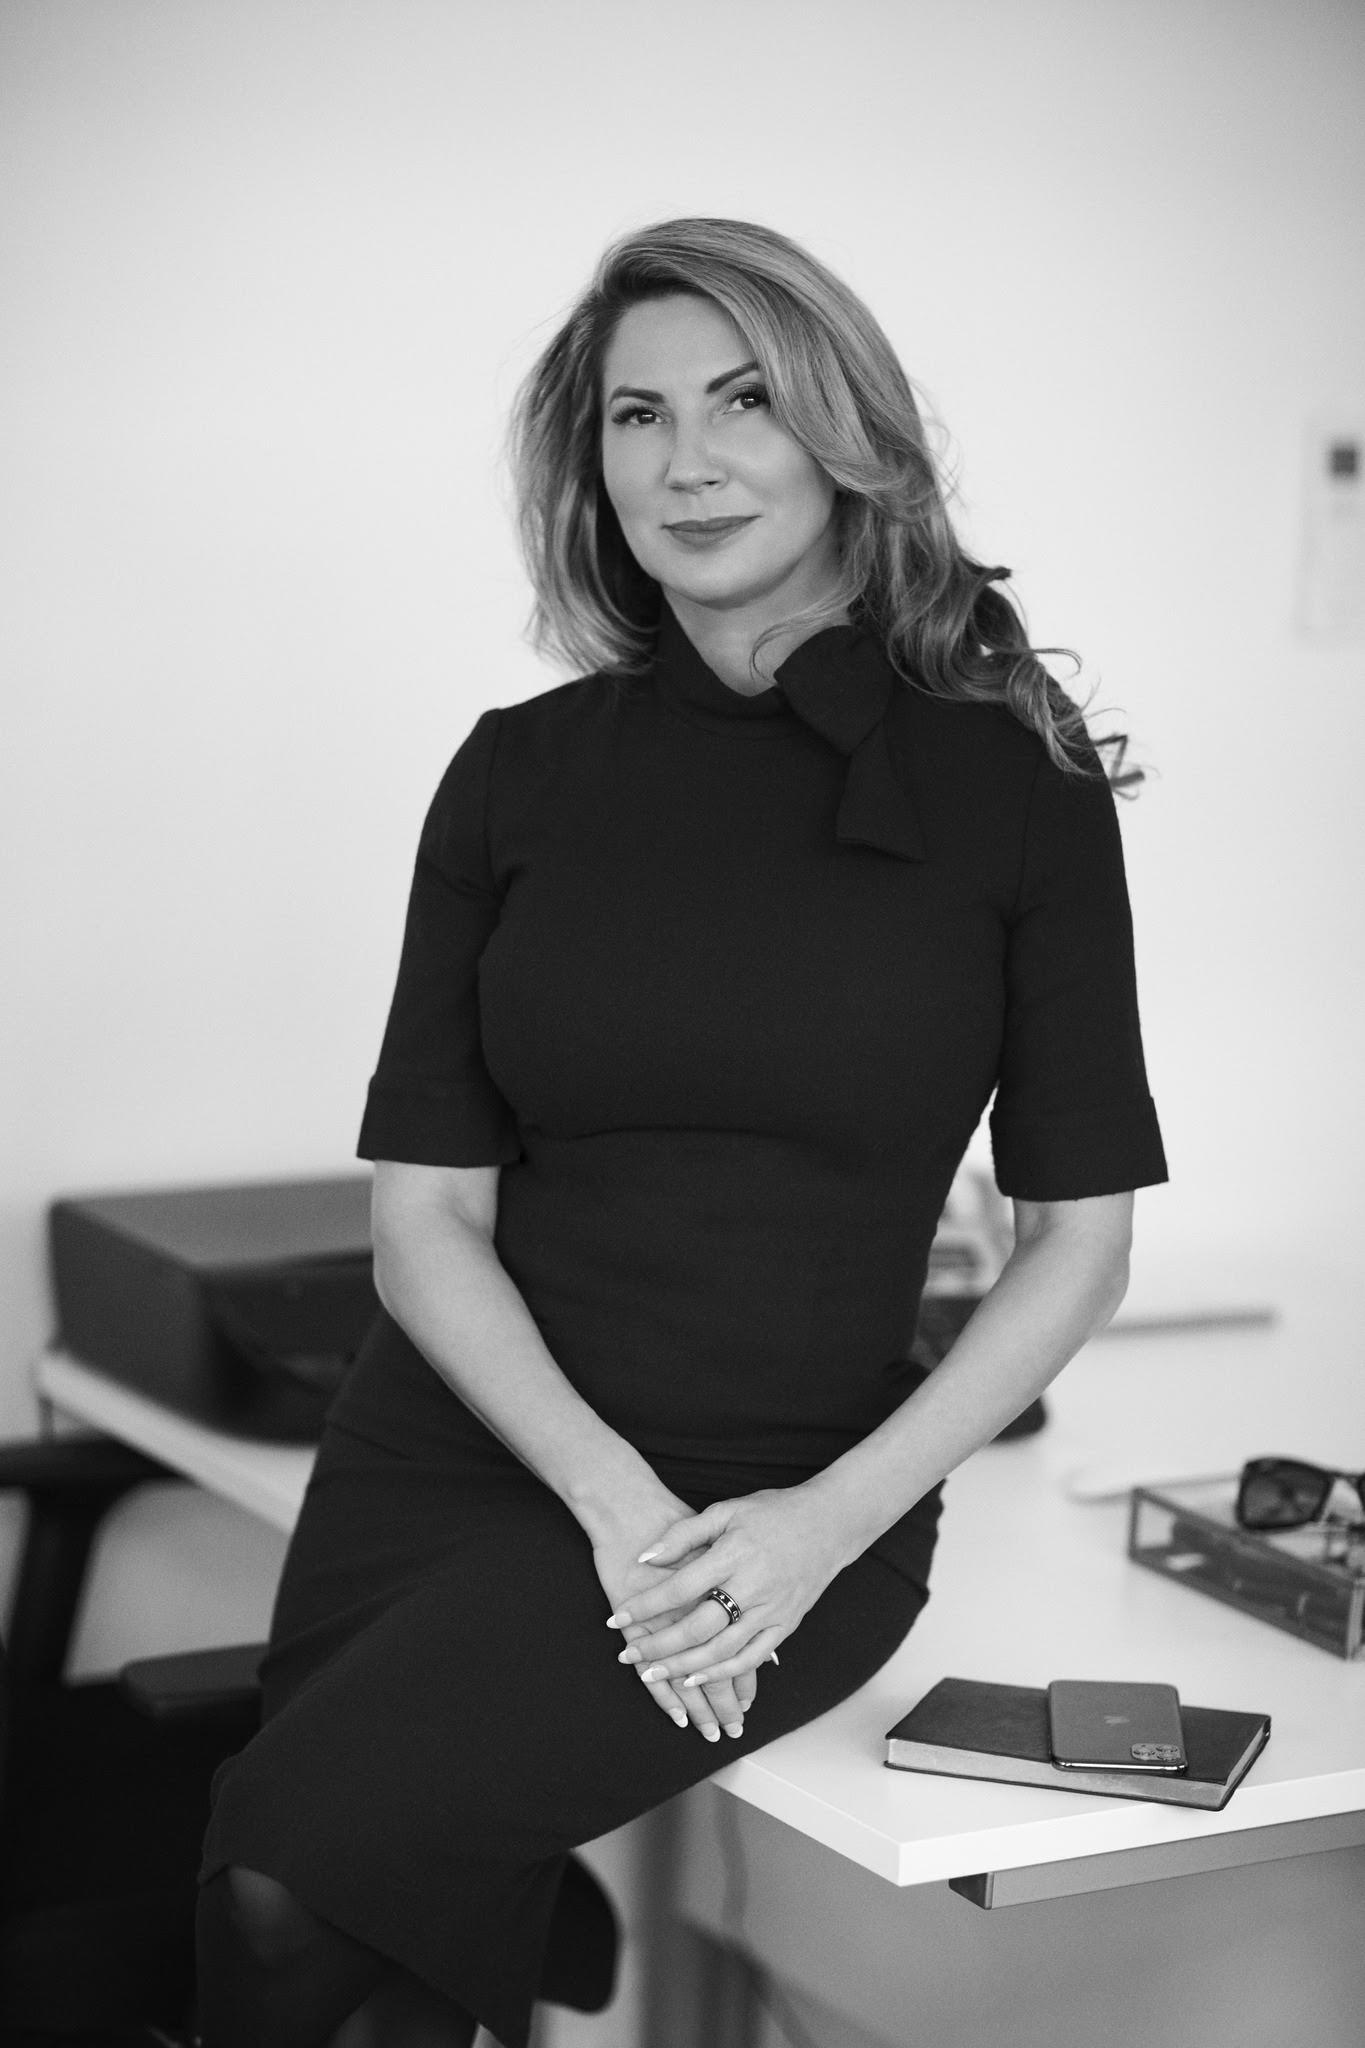 Chloe Franse - Founder & CEO